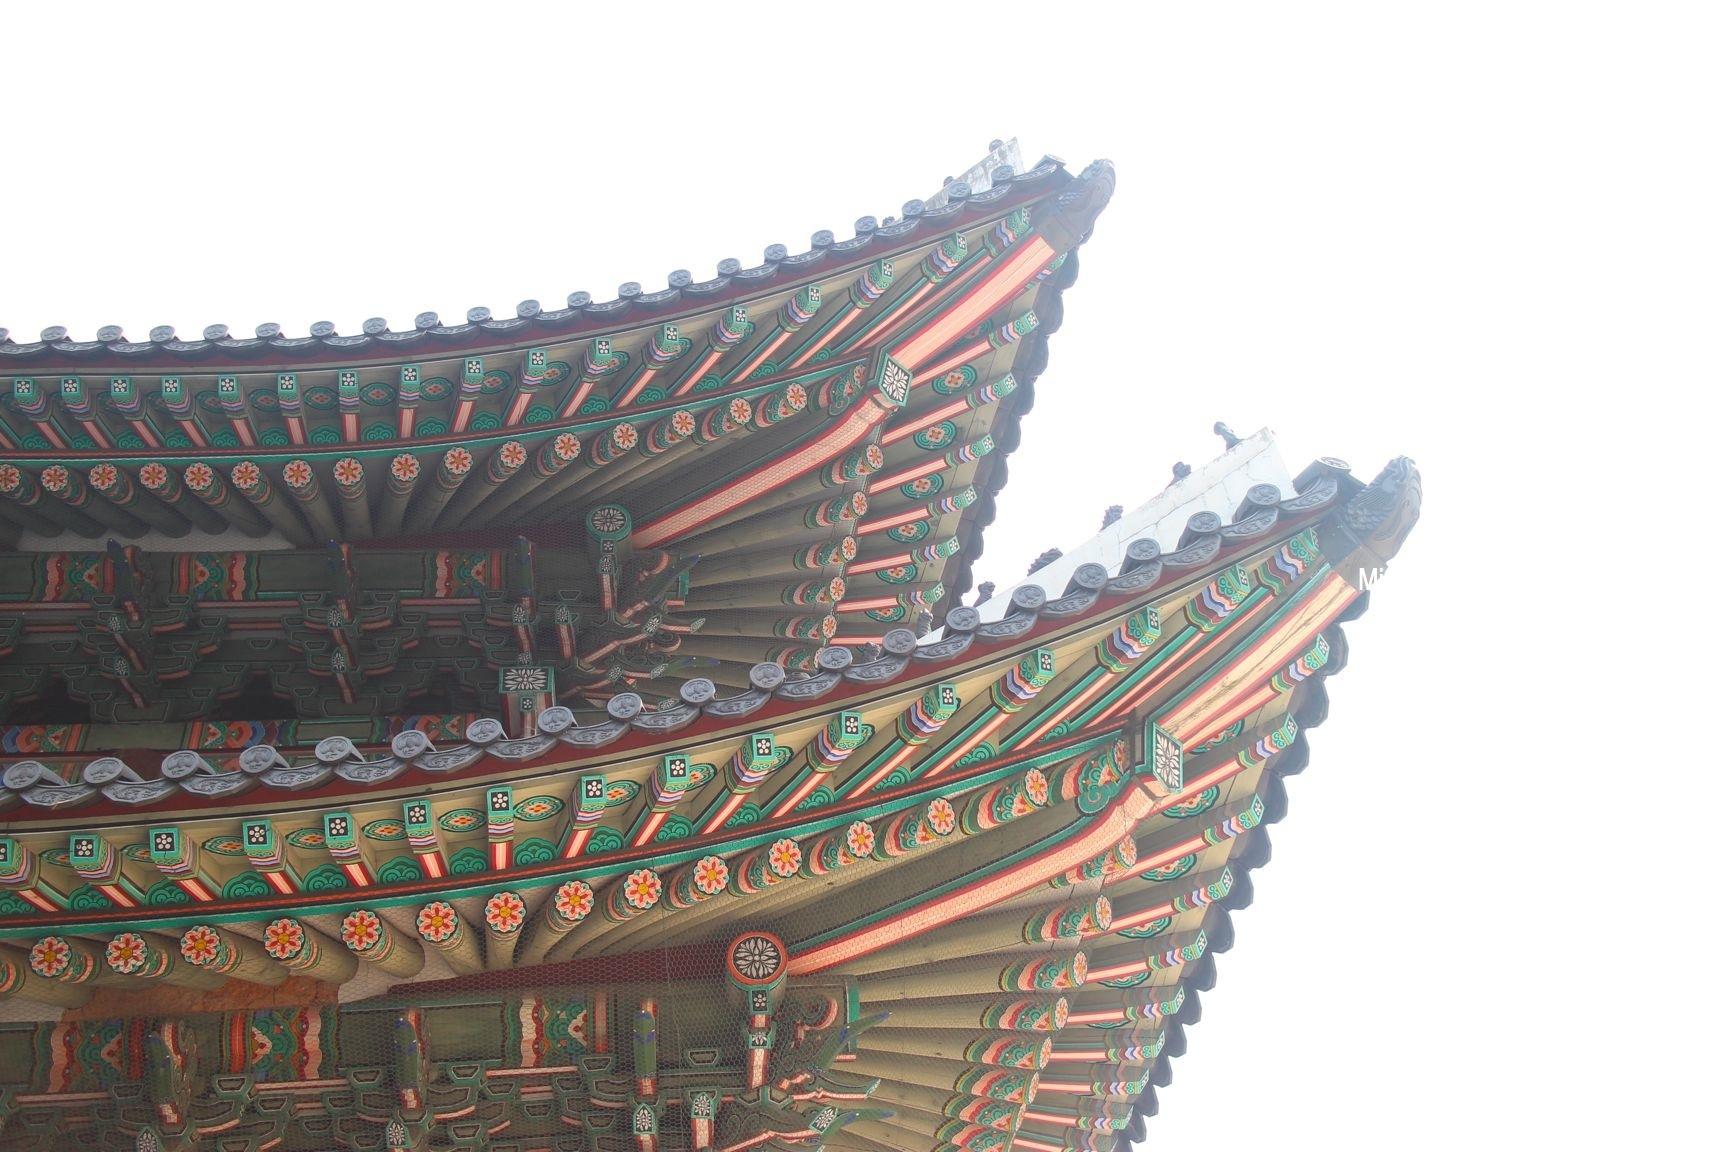 changdeokgung-palace-seoul-korea